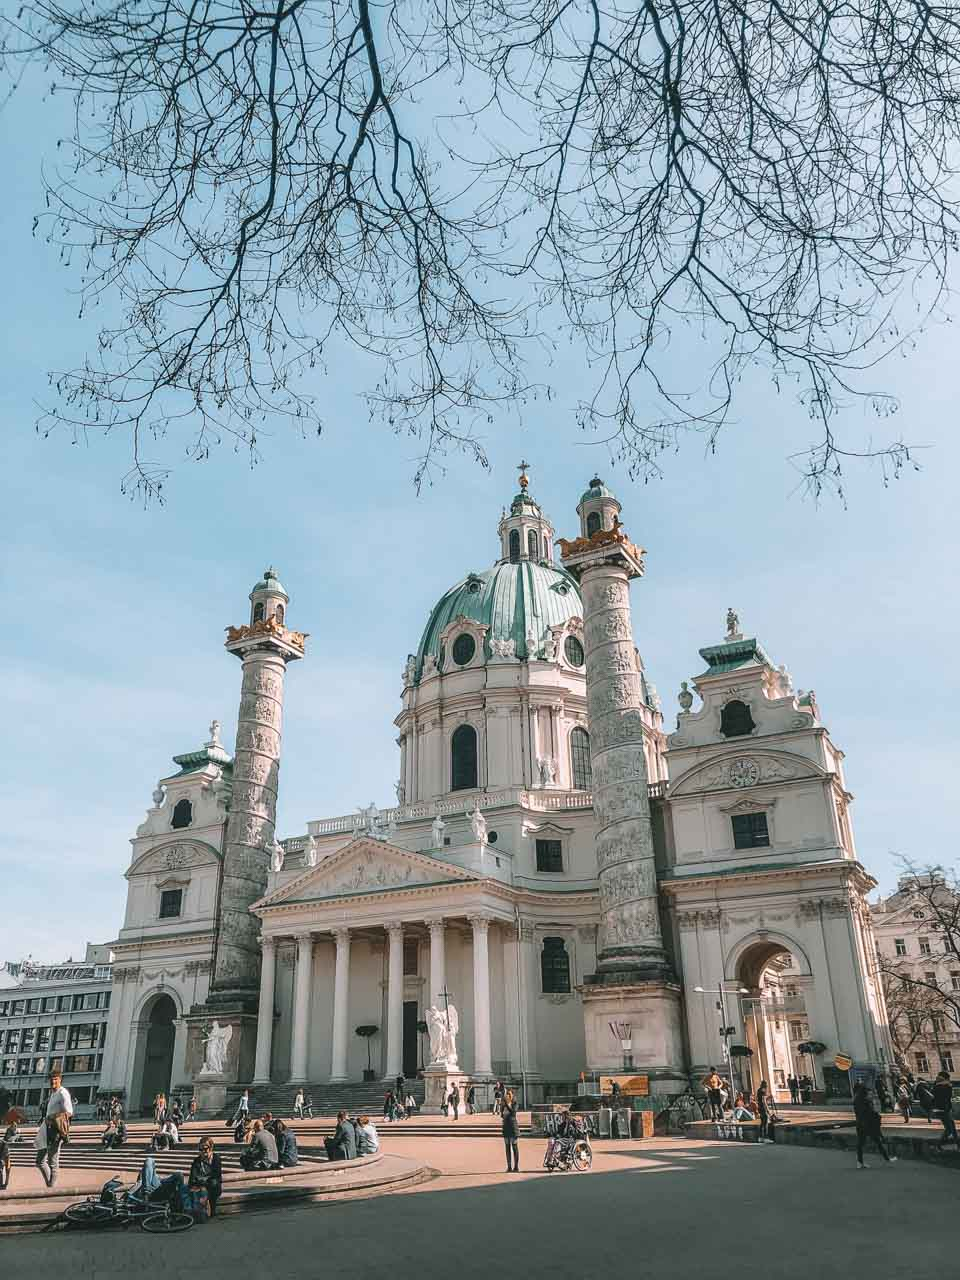 St. Charles' Church in Vienna, Austria